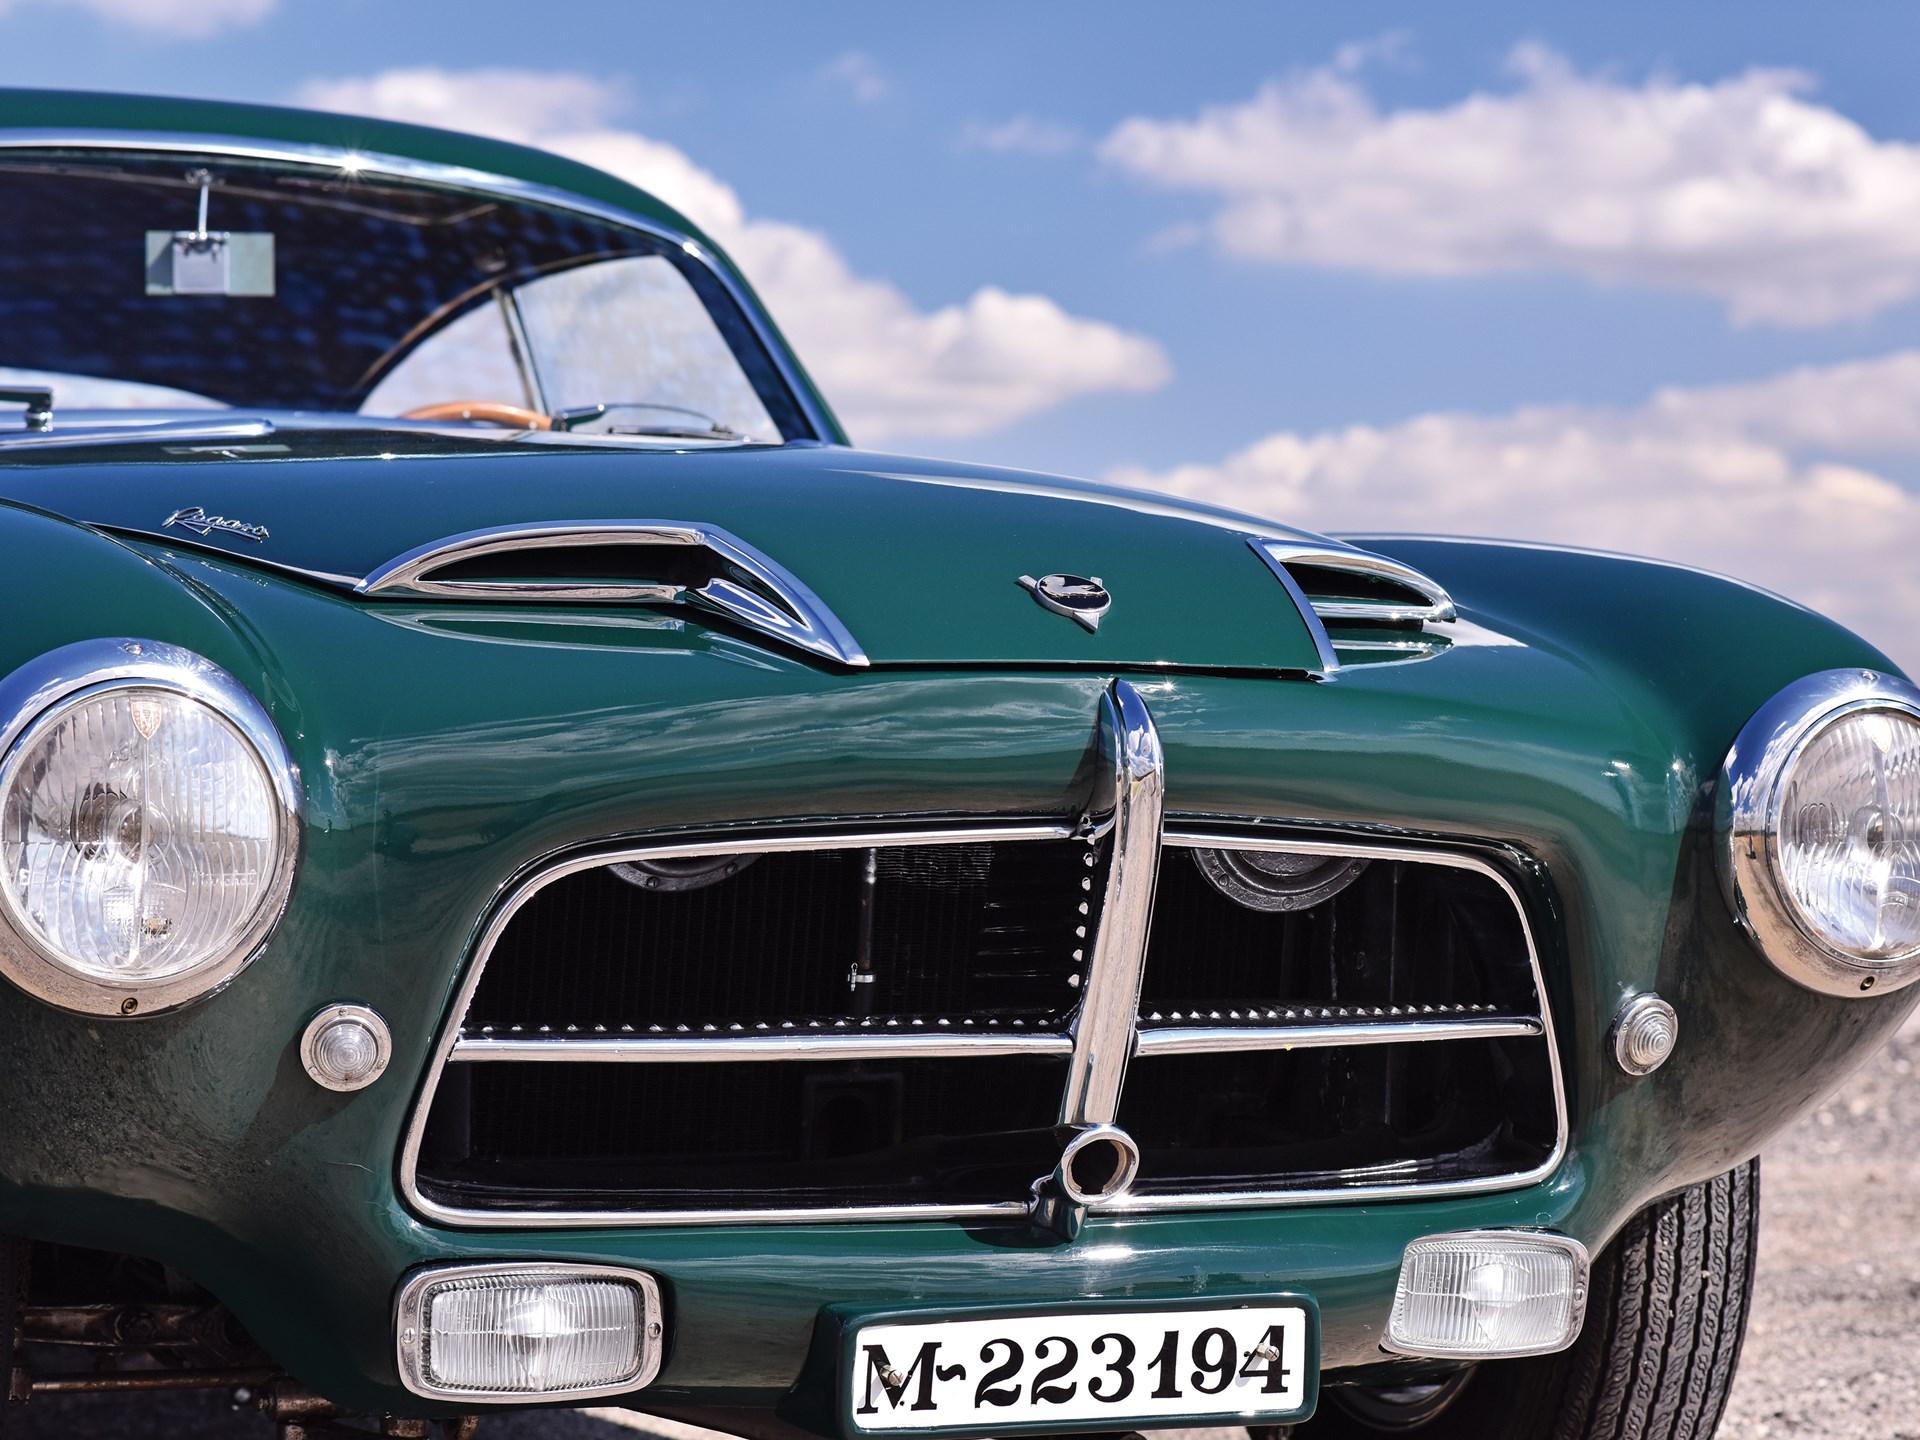 1954 Pegaso Z-102 3.2 Berlinetta by Touring